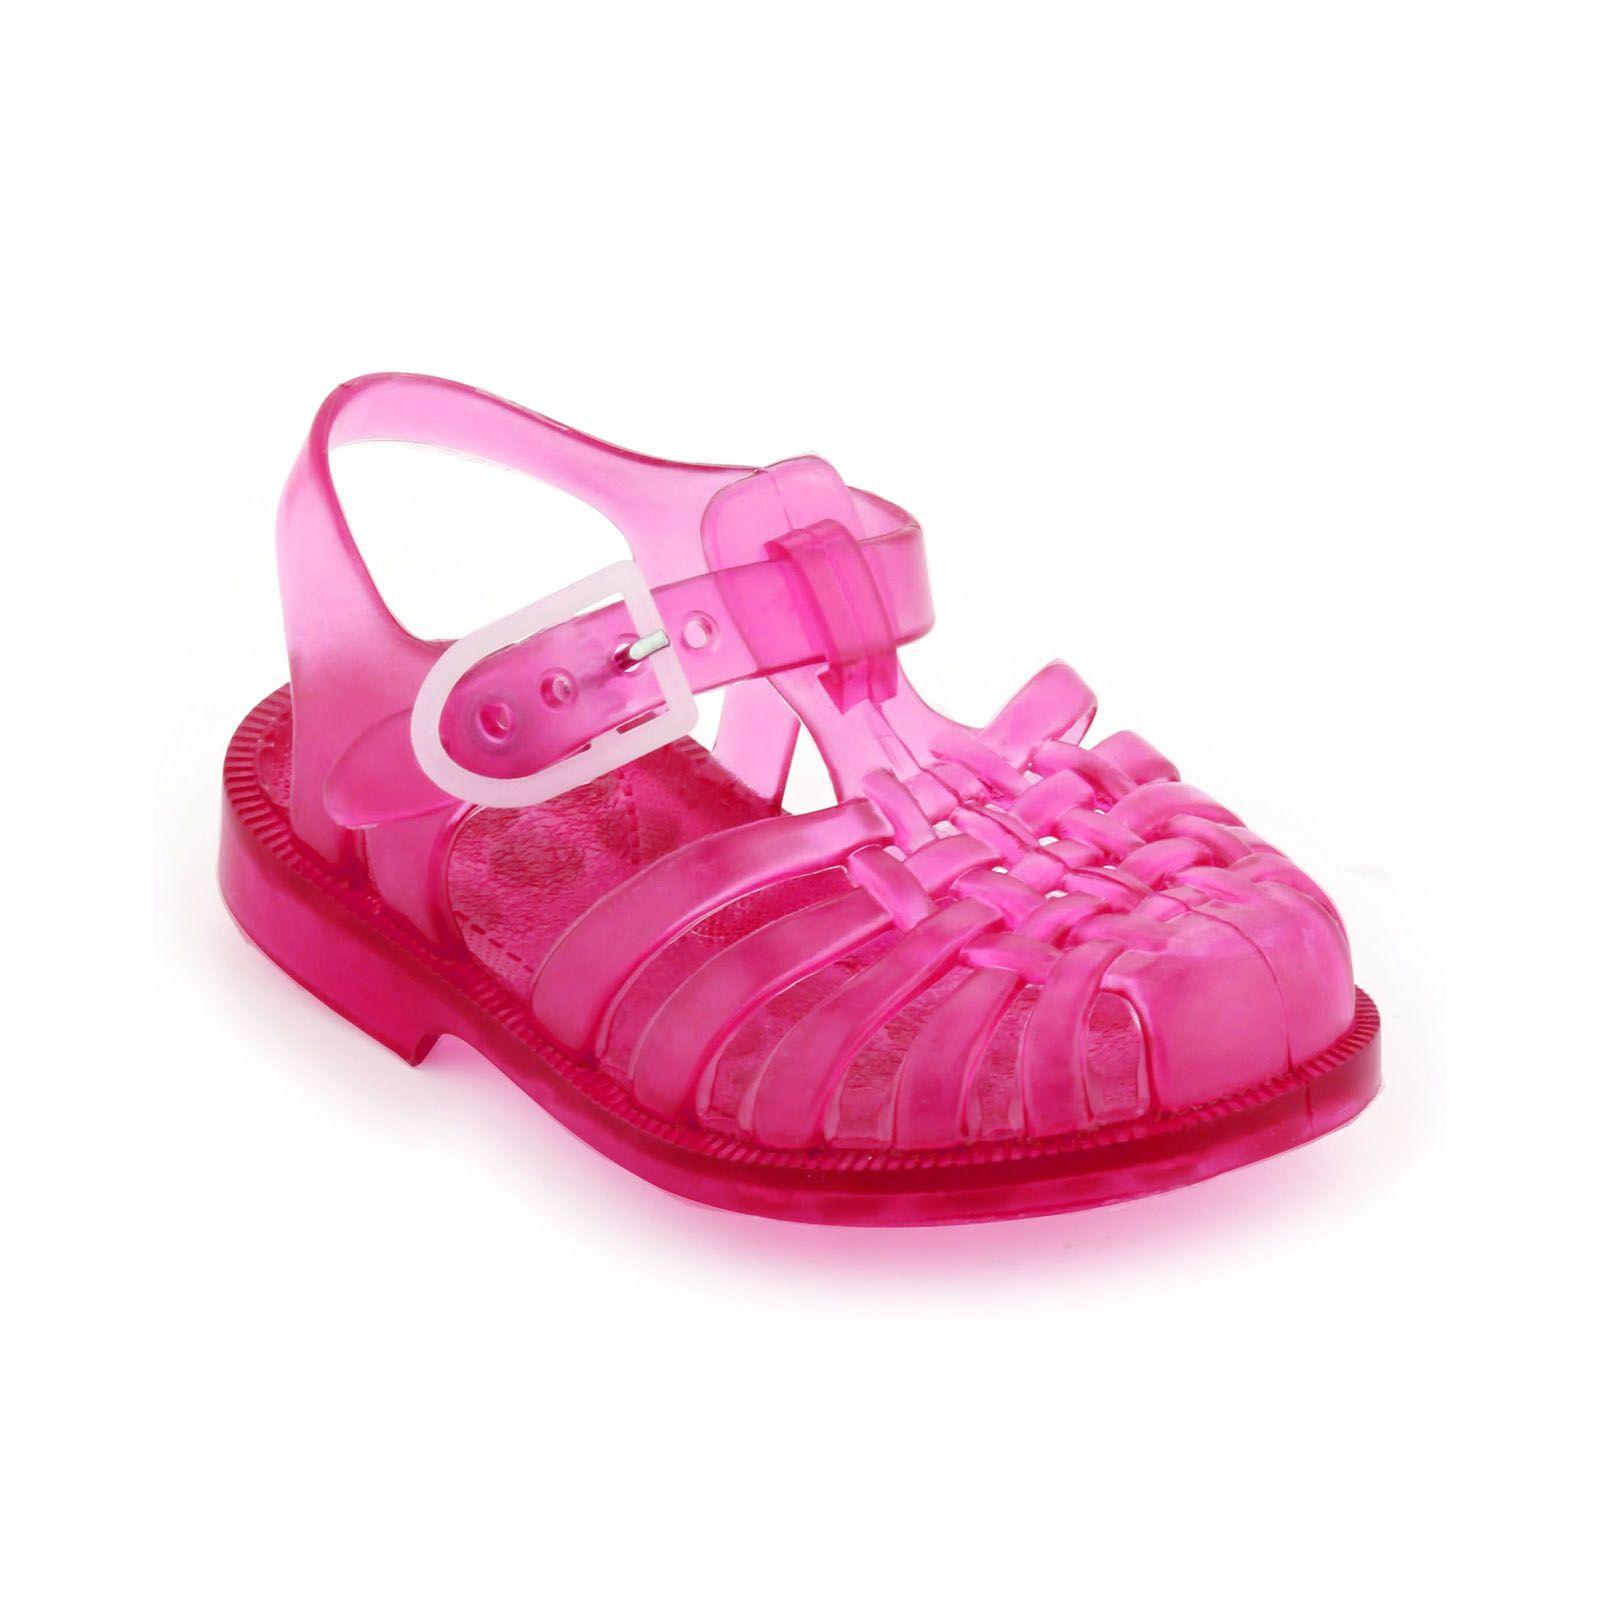 Archimede fuchsia jelly sandals Kids Stuff Pinterest